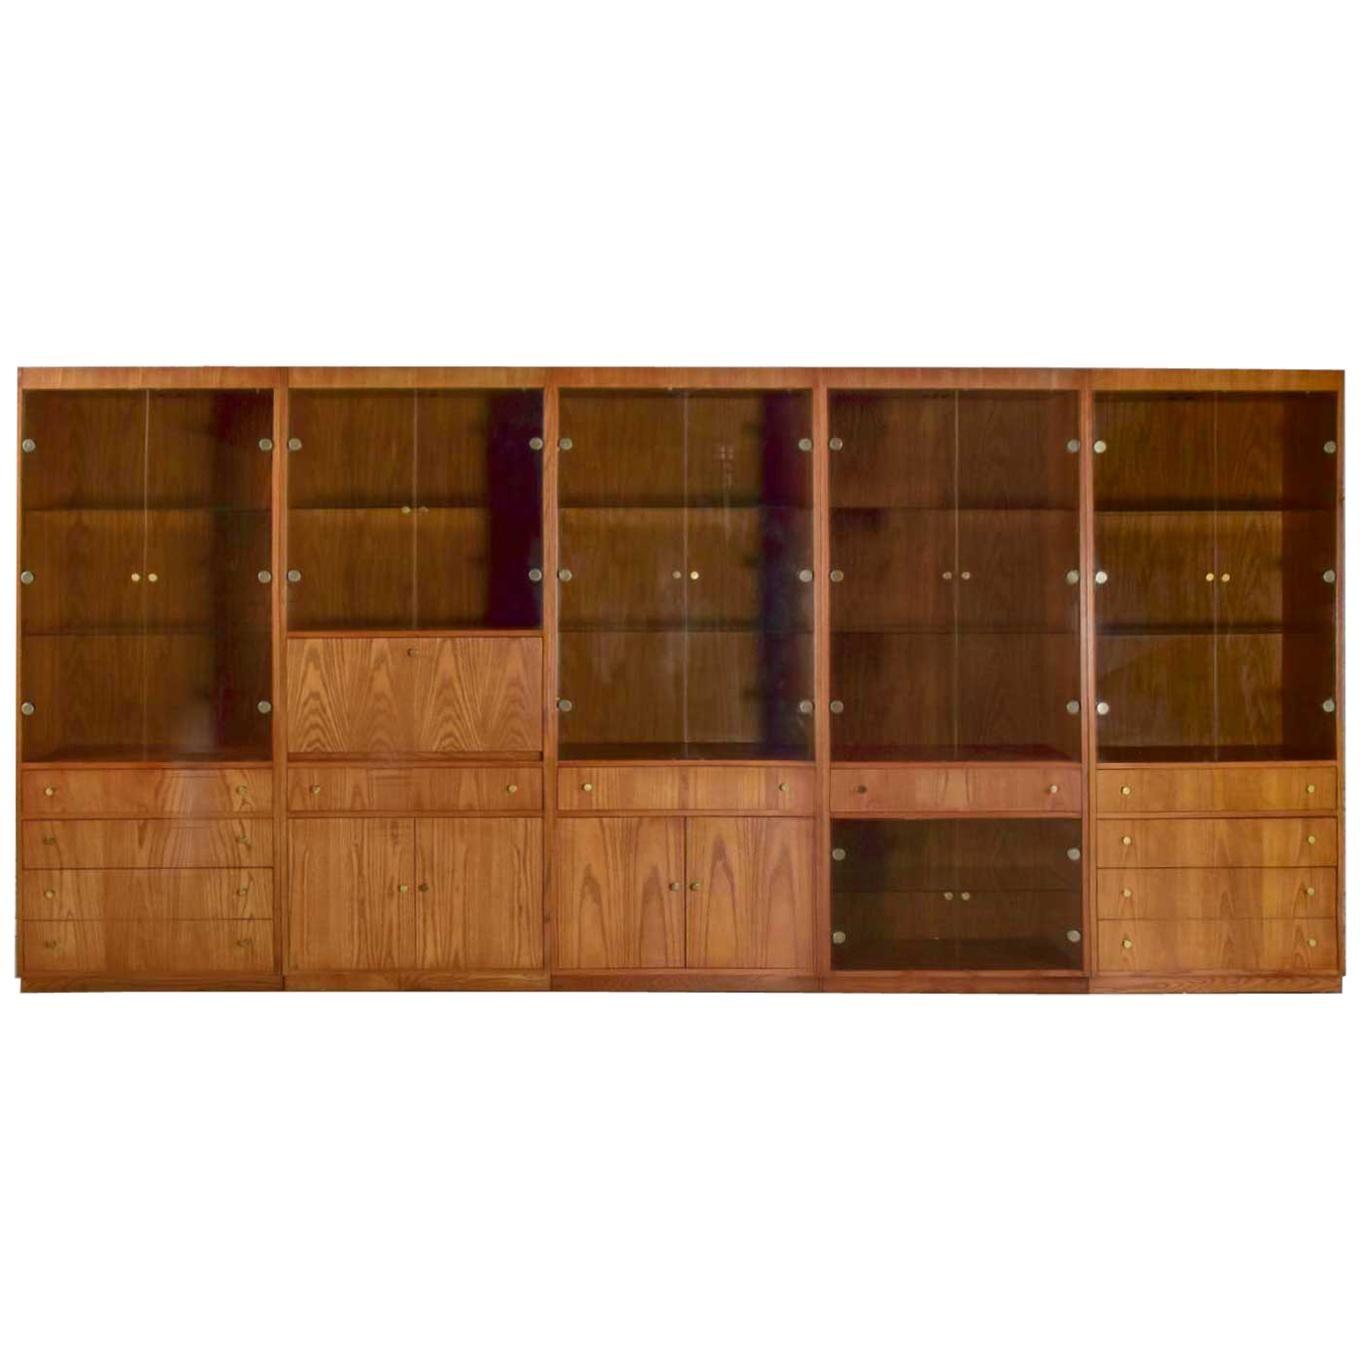 MCM Hooker 5 Section Oak Veneer Display Cabinet Wall Unit Smoked Glass Doors